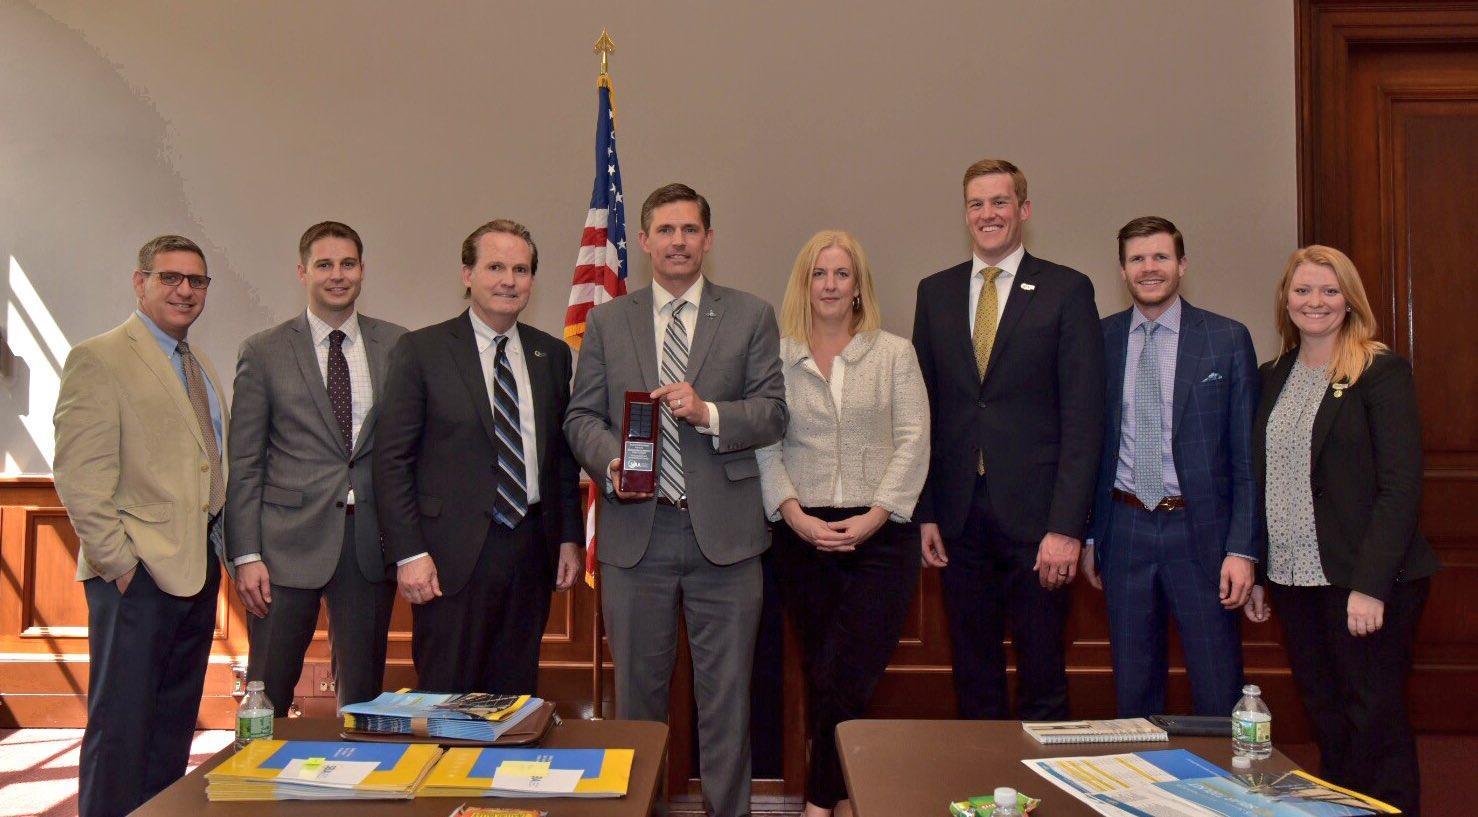 U.S. Senator Martin Heinrich (D-N.M.) receives the Solar Champion Award from the Solar Energy Industries Association (SEIA)